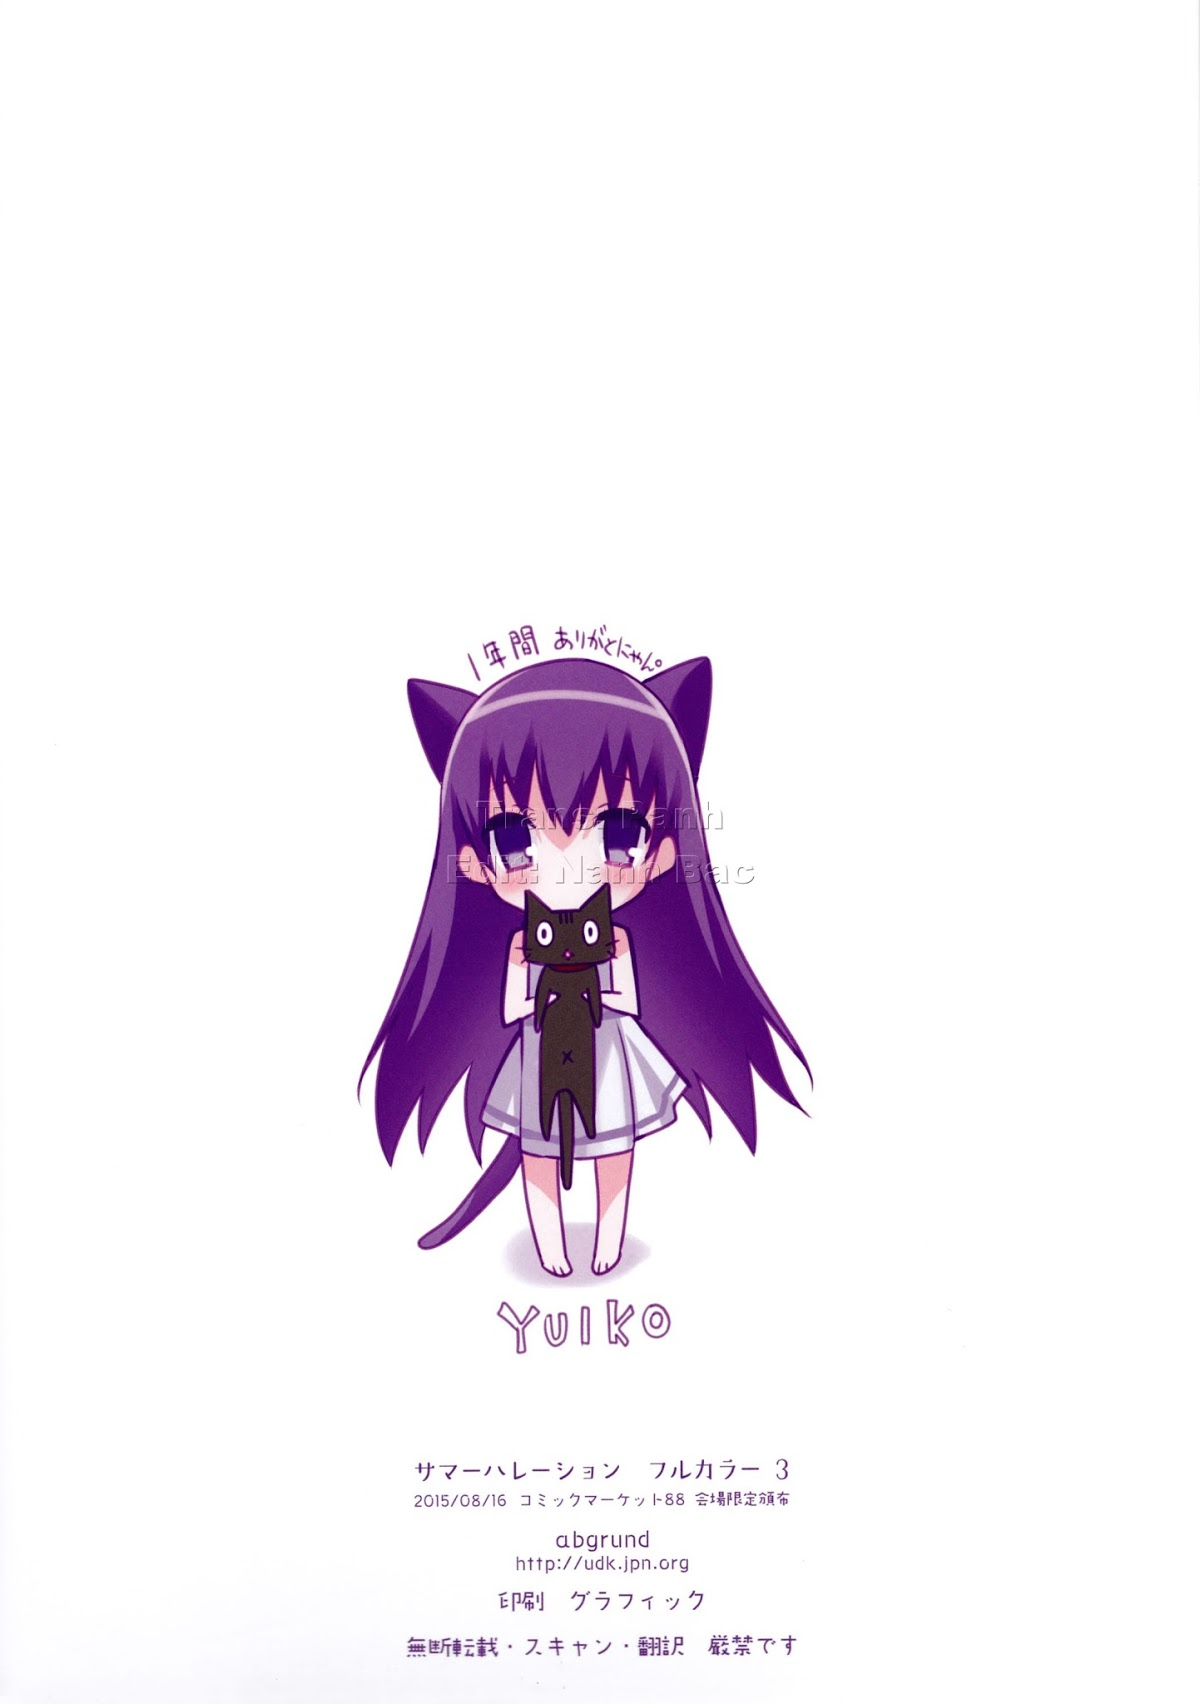 HentaiVN.net - Ảnh 12 - Summer Halation Full Color 3 - Oneshot